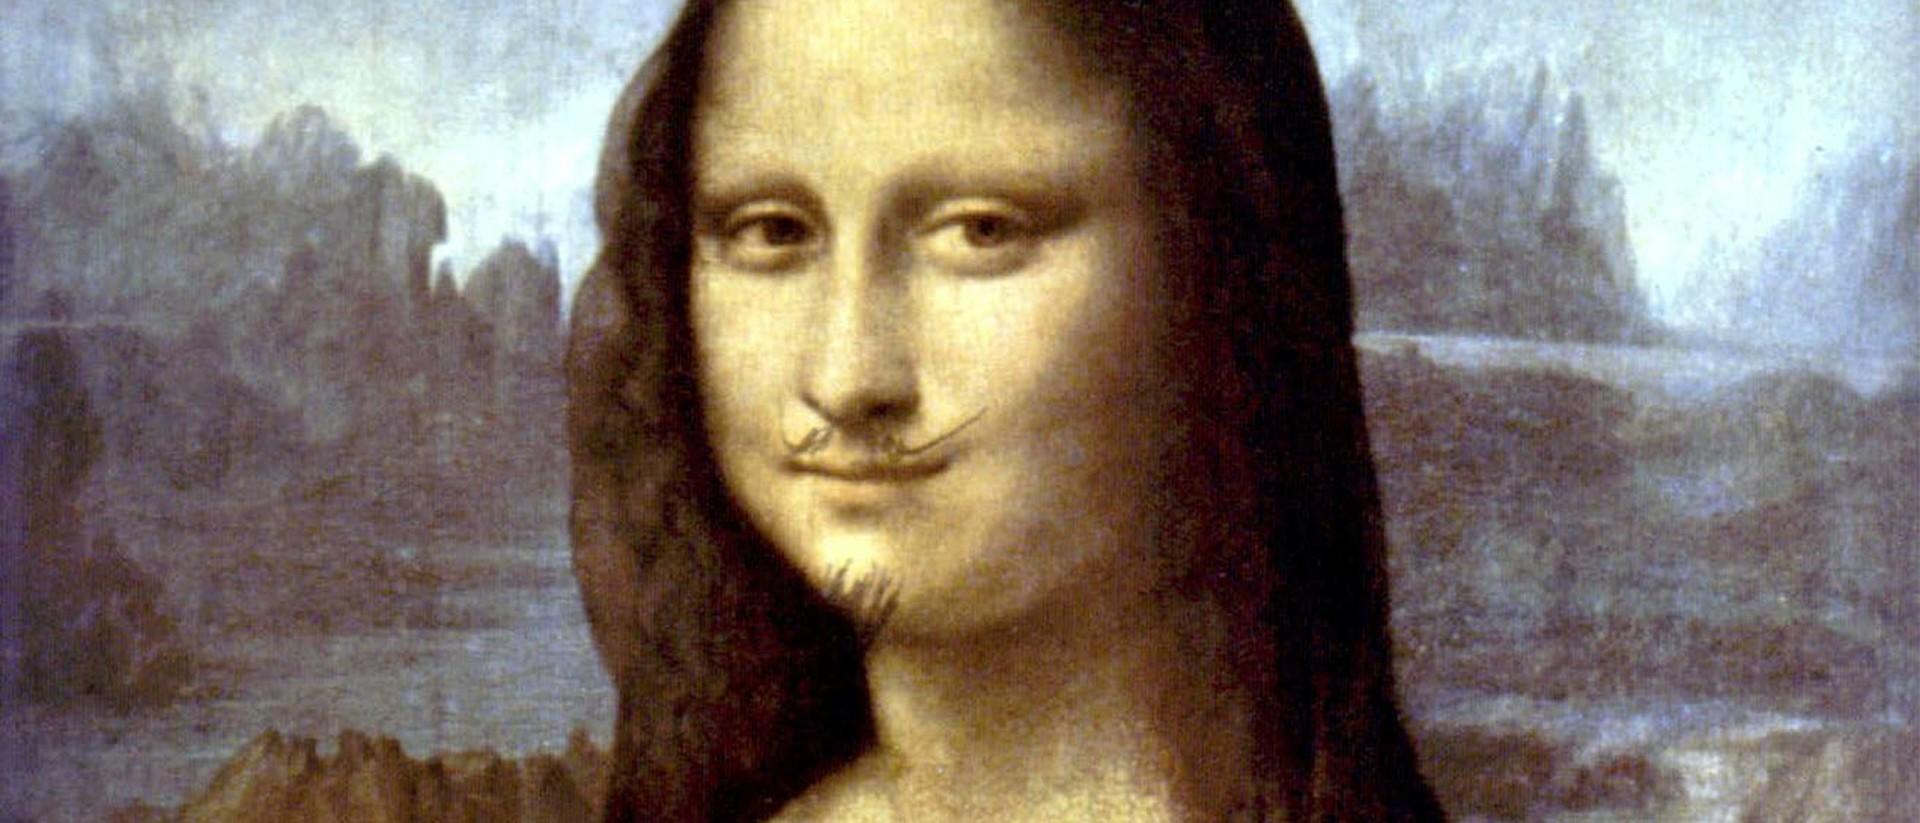 marcel duchamp mona lisa essay 91 121 113 106 marcel duchamp mona lisa essay